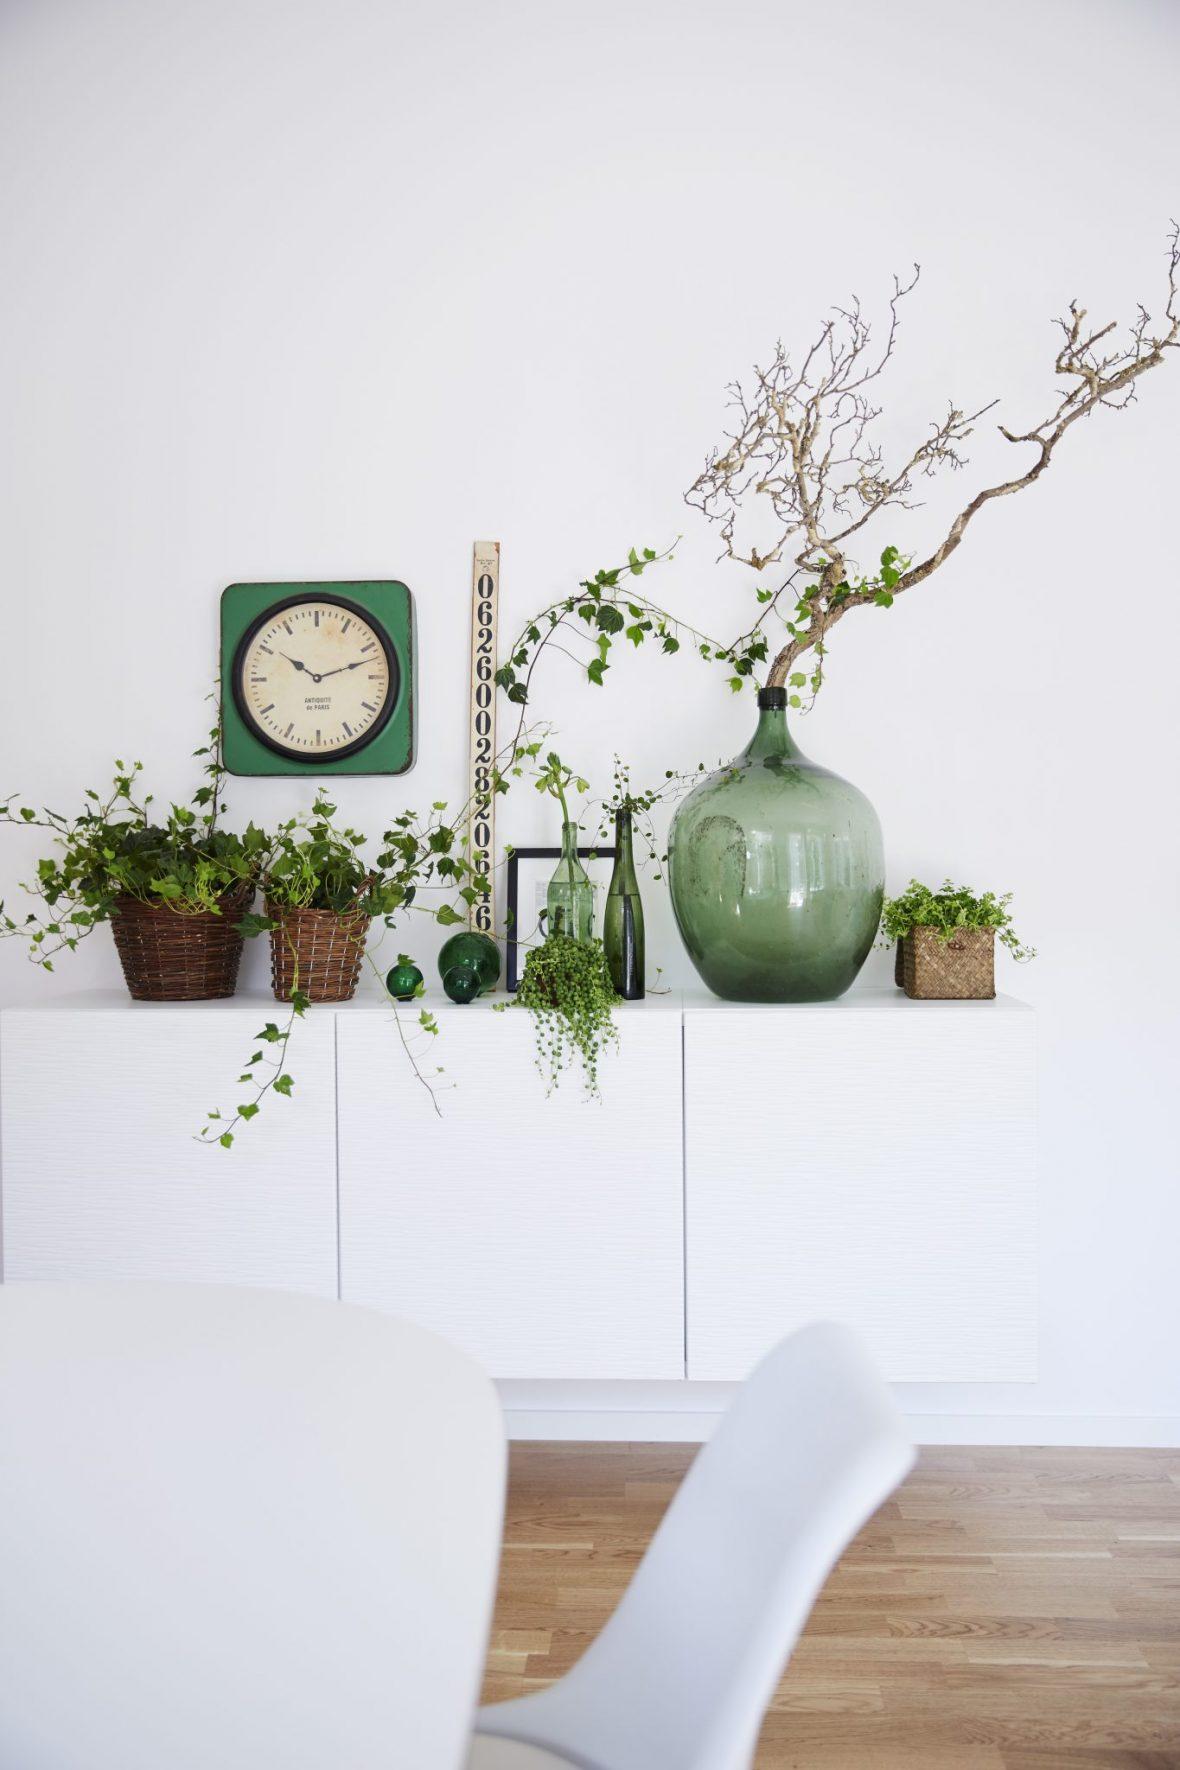 Blomsterfrämjandet inredning